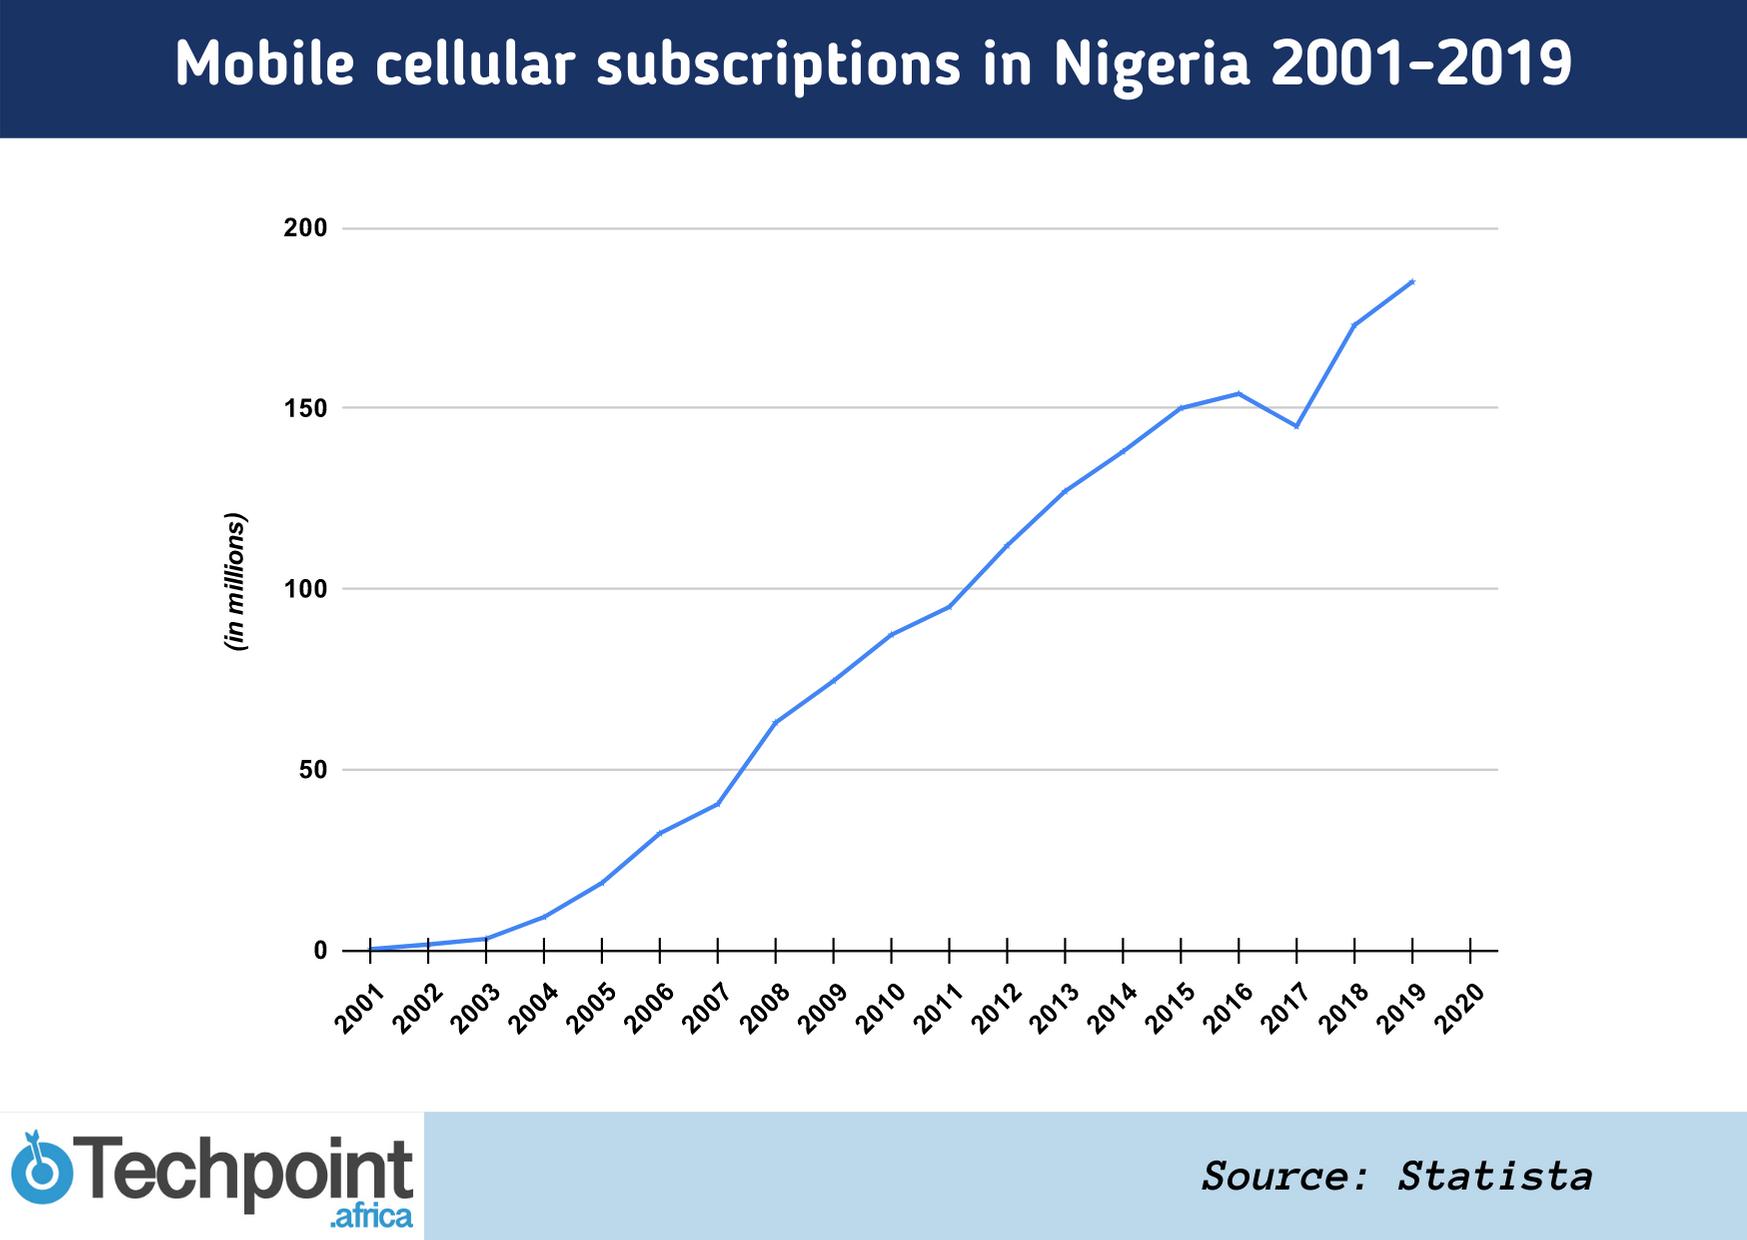 Cellular subscription